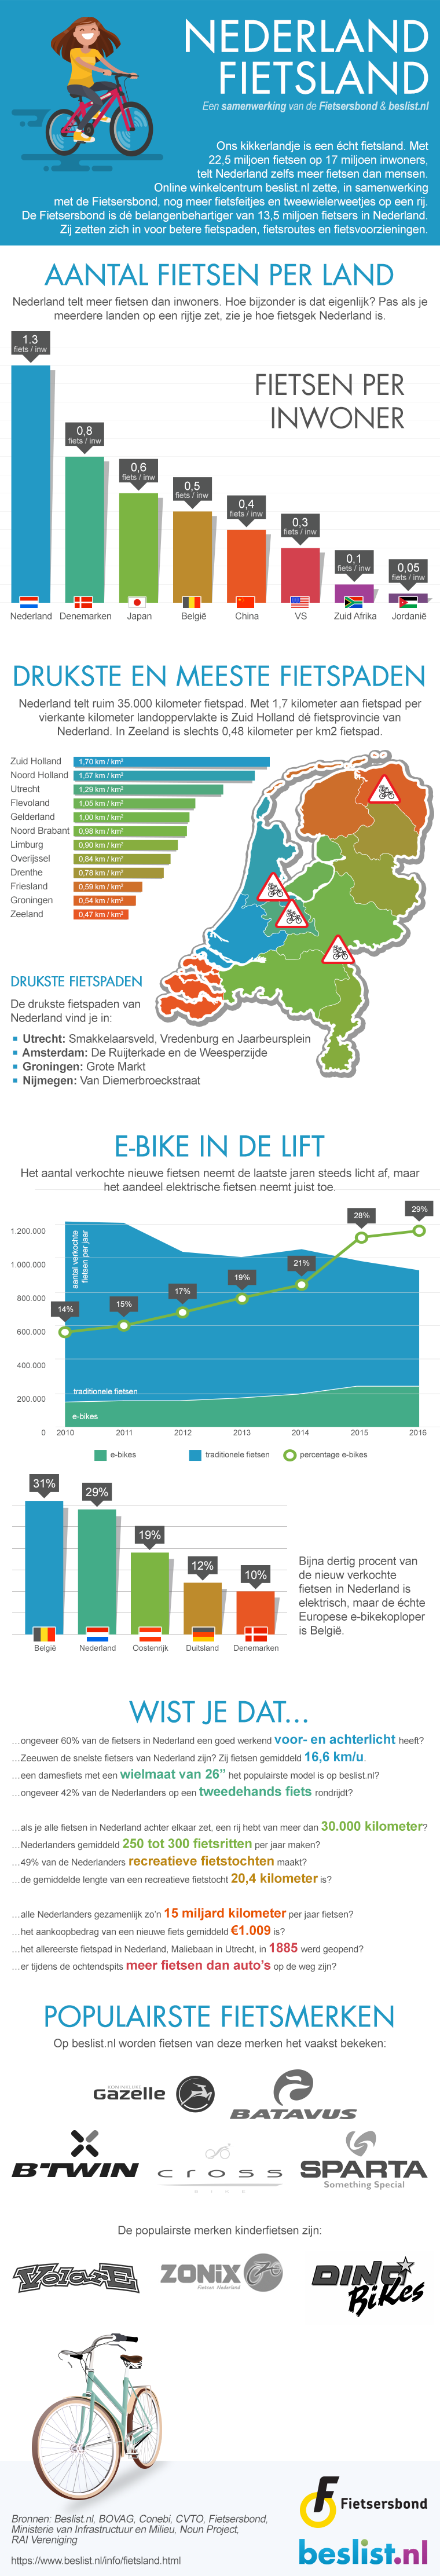 Infographic Nederland fietsland